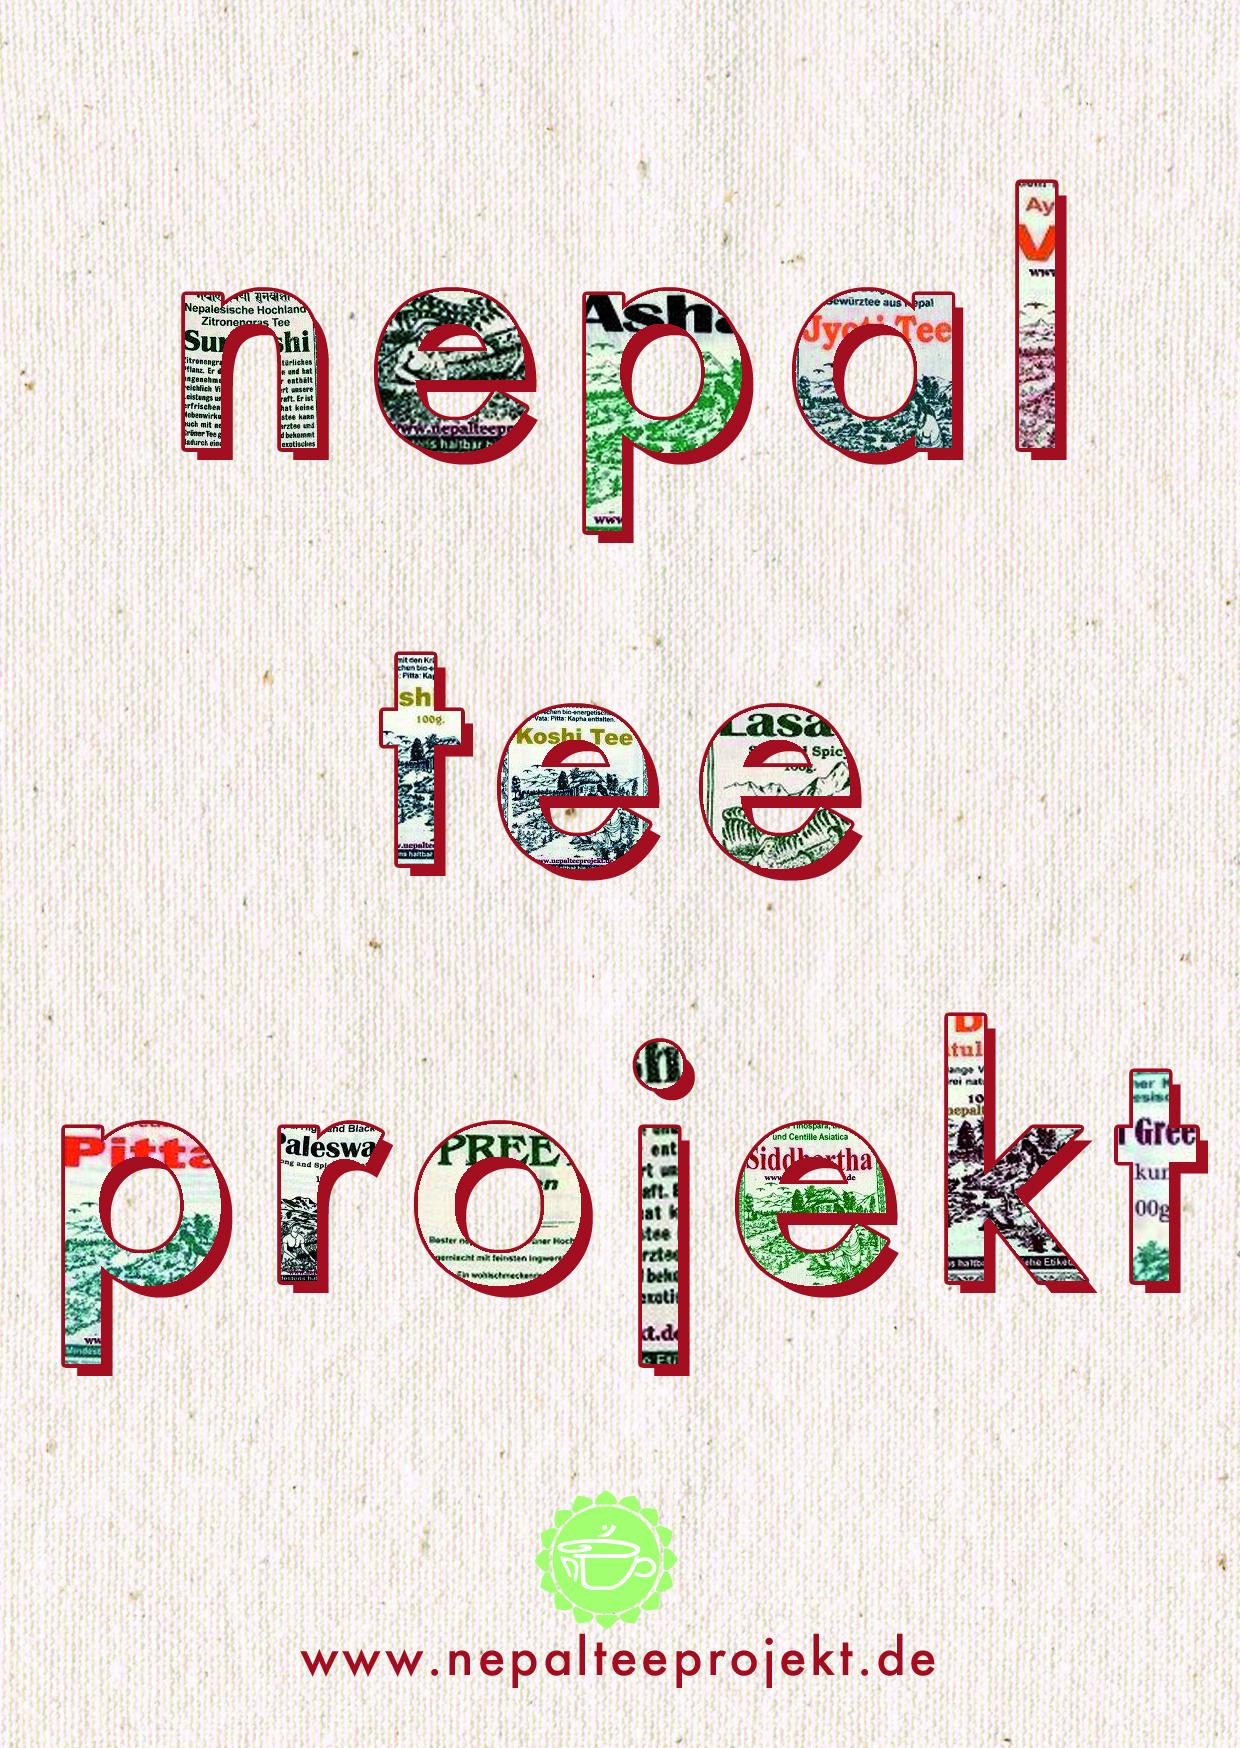 Nepalteeprojekt